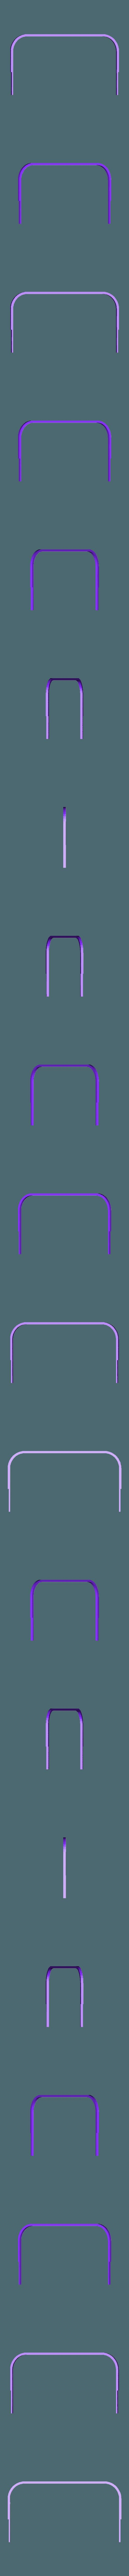 TruckV3_Props_flatbed_barx4.STL Download STL file 3D Printed RC Truck V3 • 3D print model, MrCrankyface